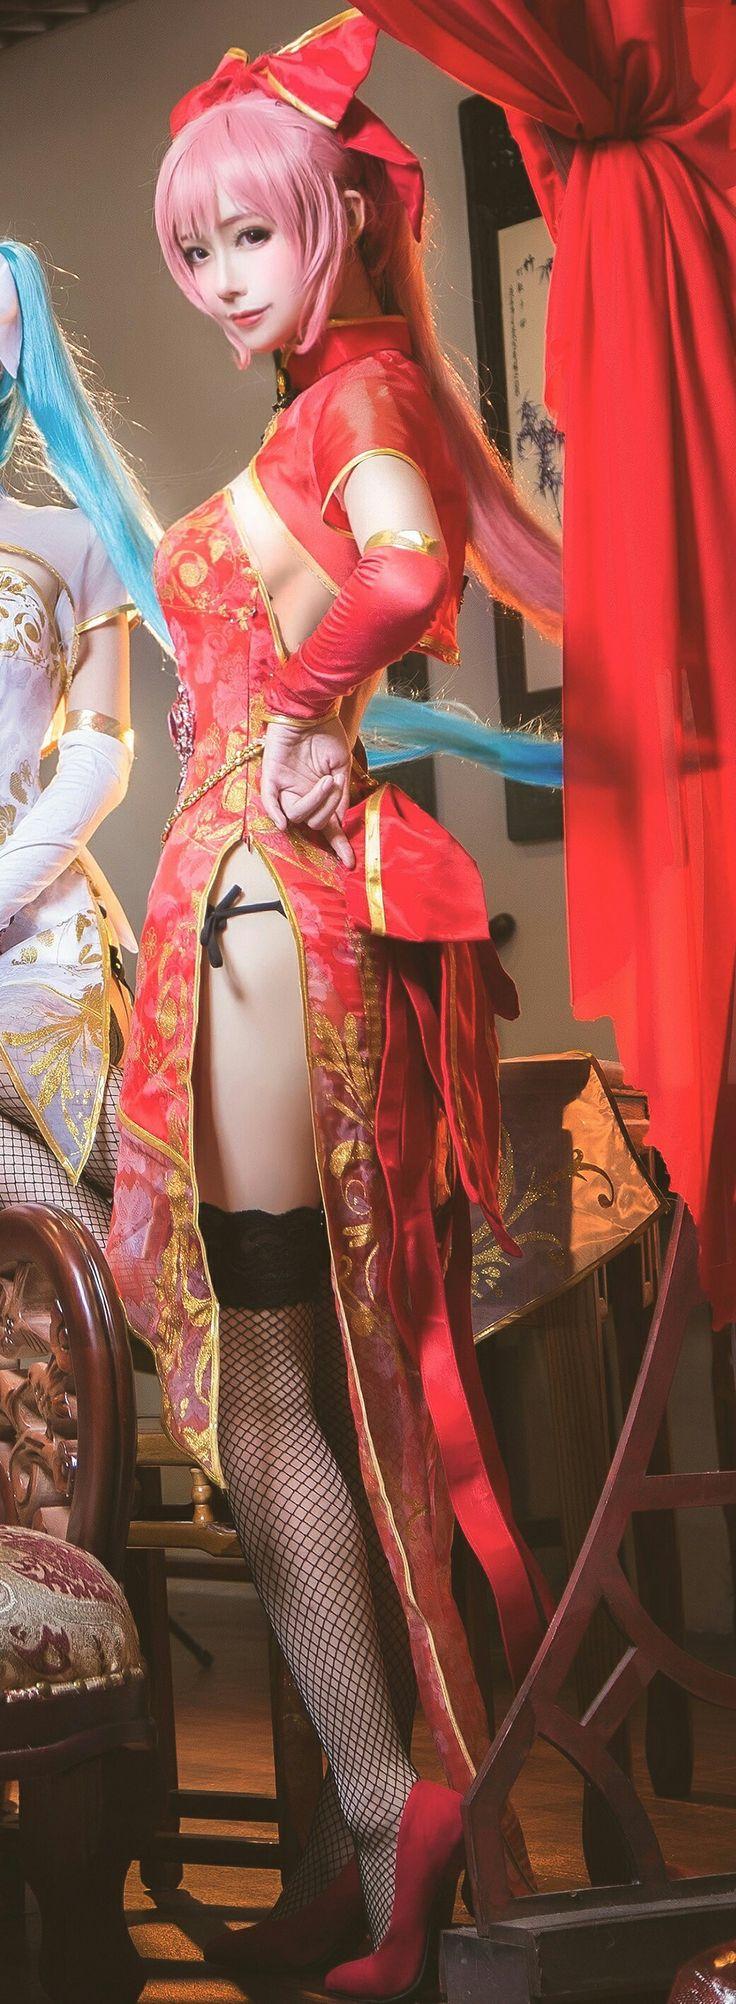 #Cosplay de Megurine Luka de #Vocaloid  Qipao Night estilo Vocaloid.  Cosplayer: 桃昔doll